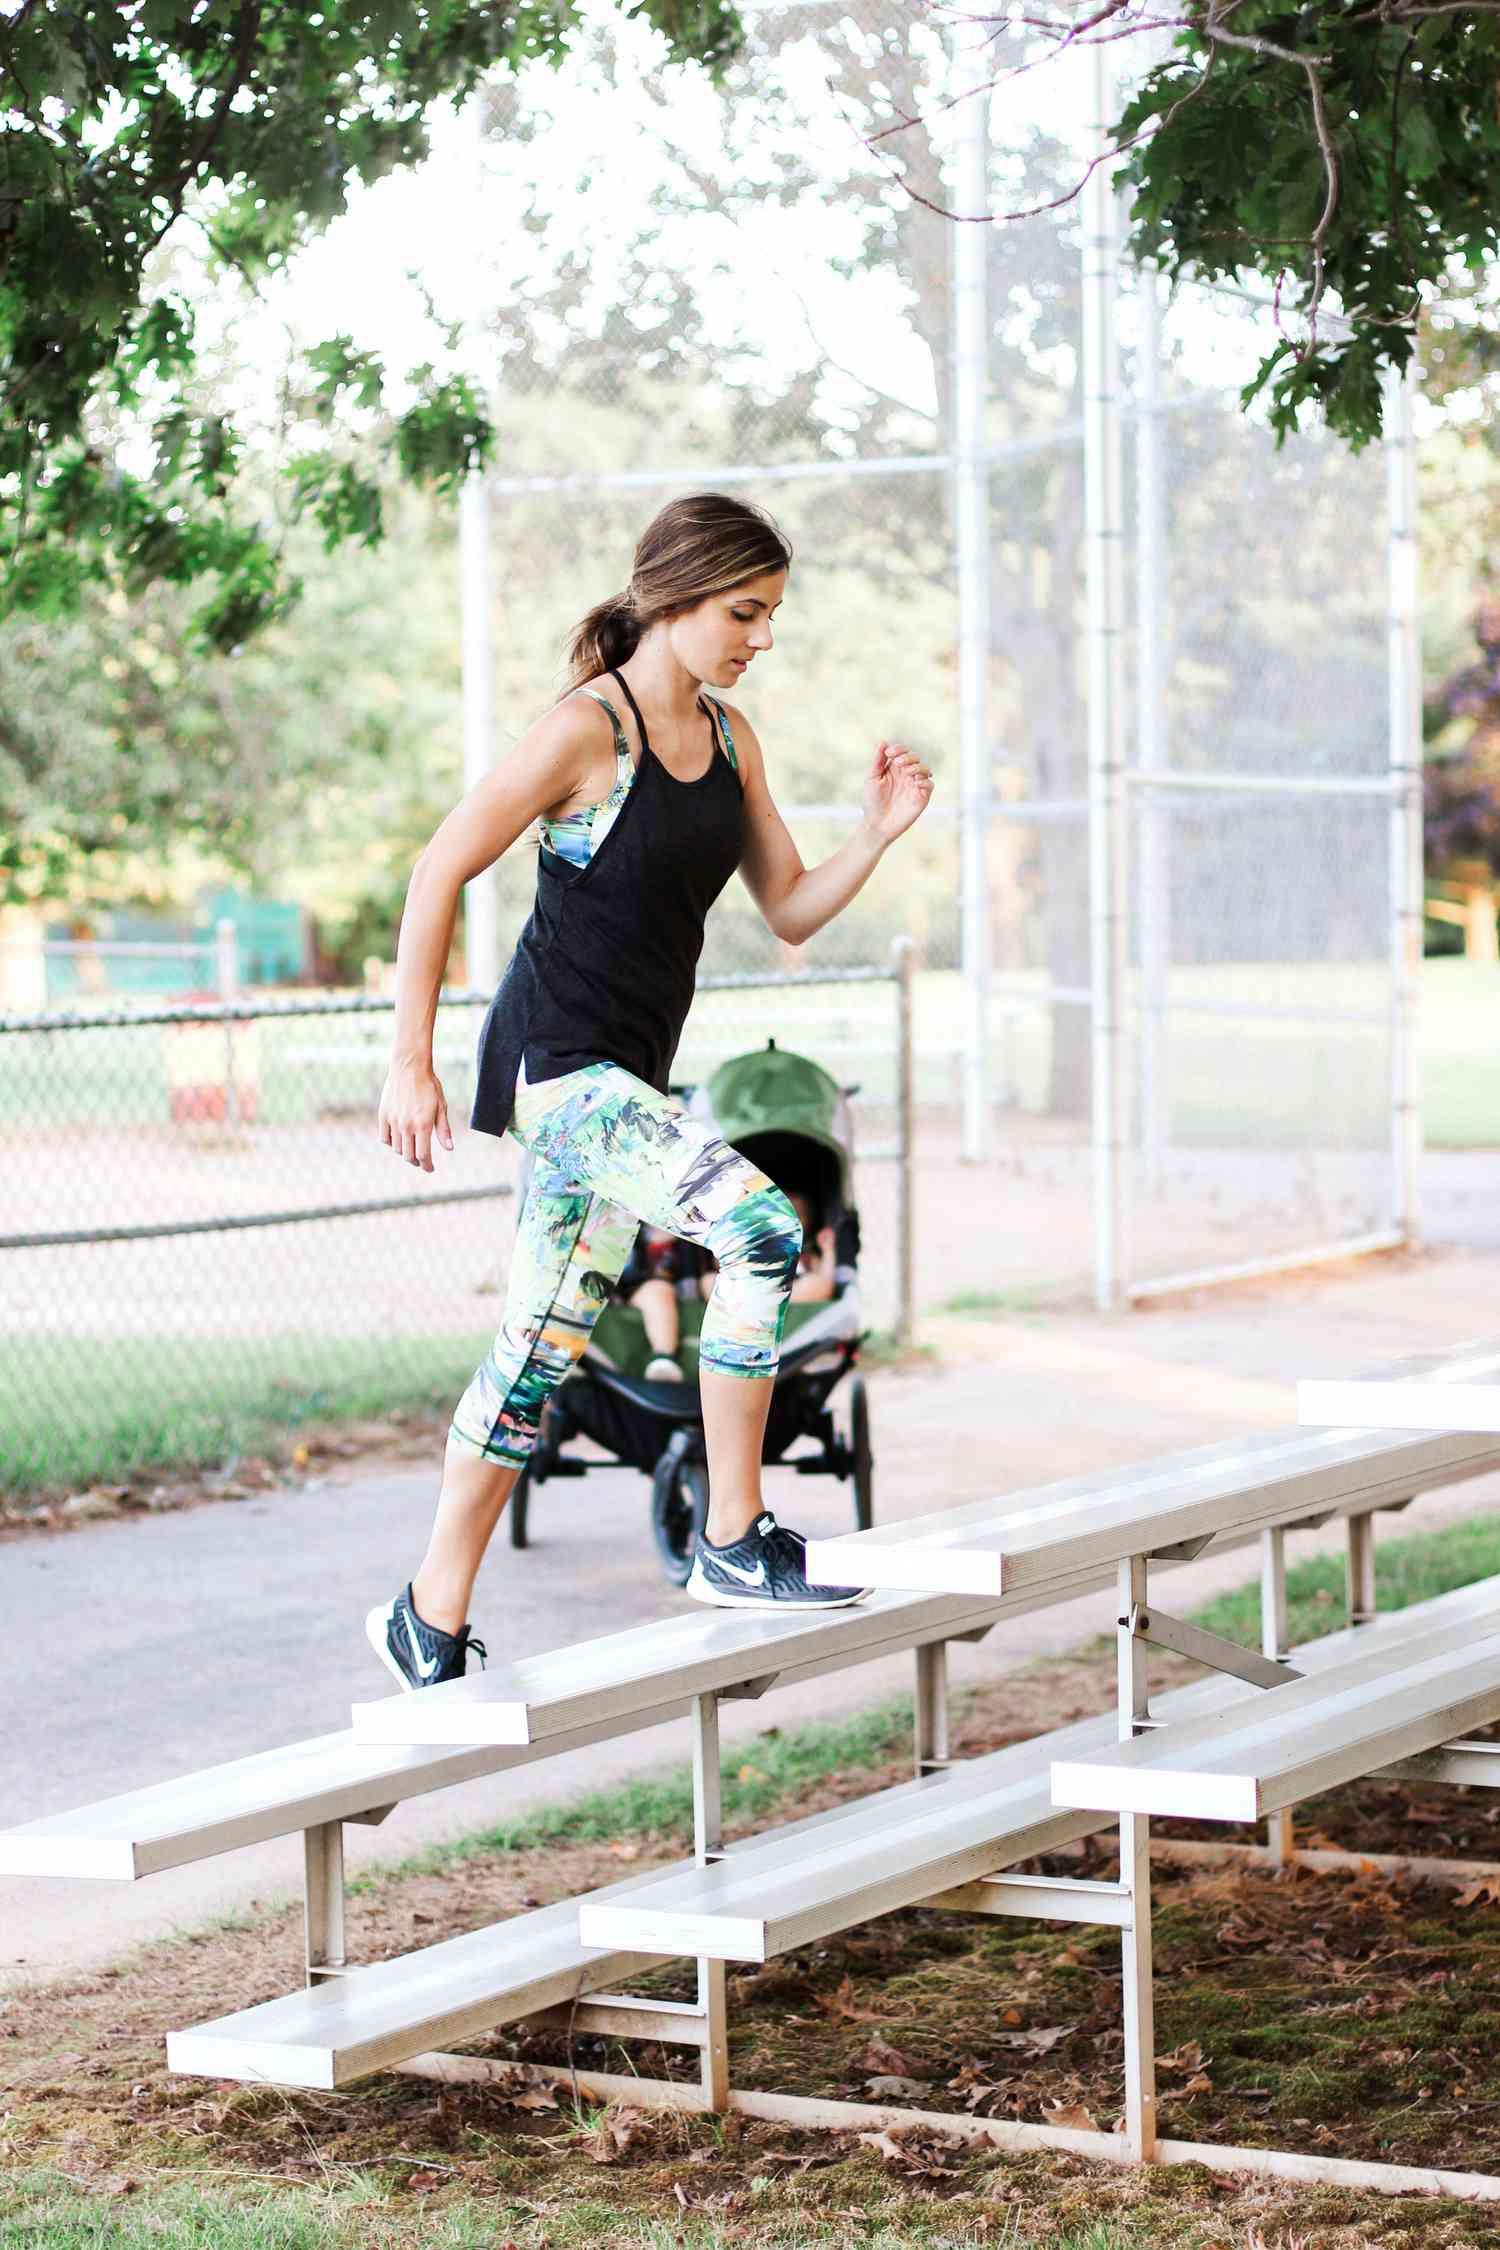 woman exercising on bleechers